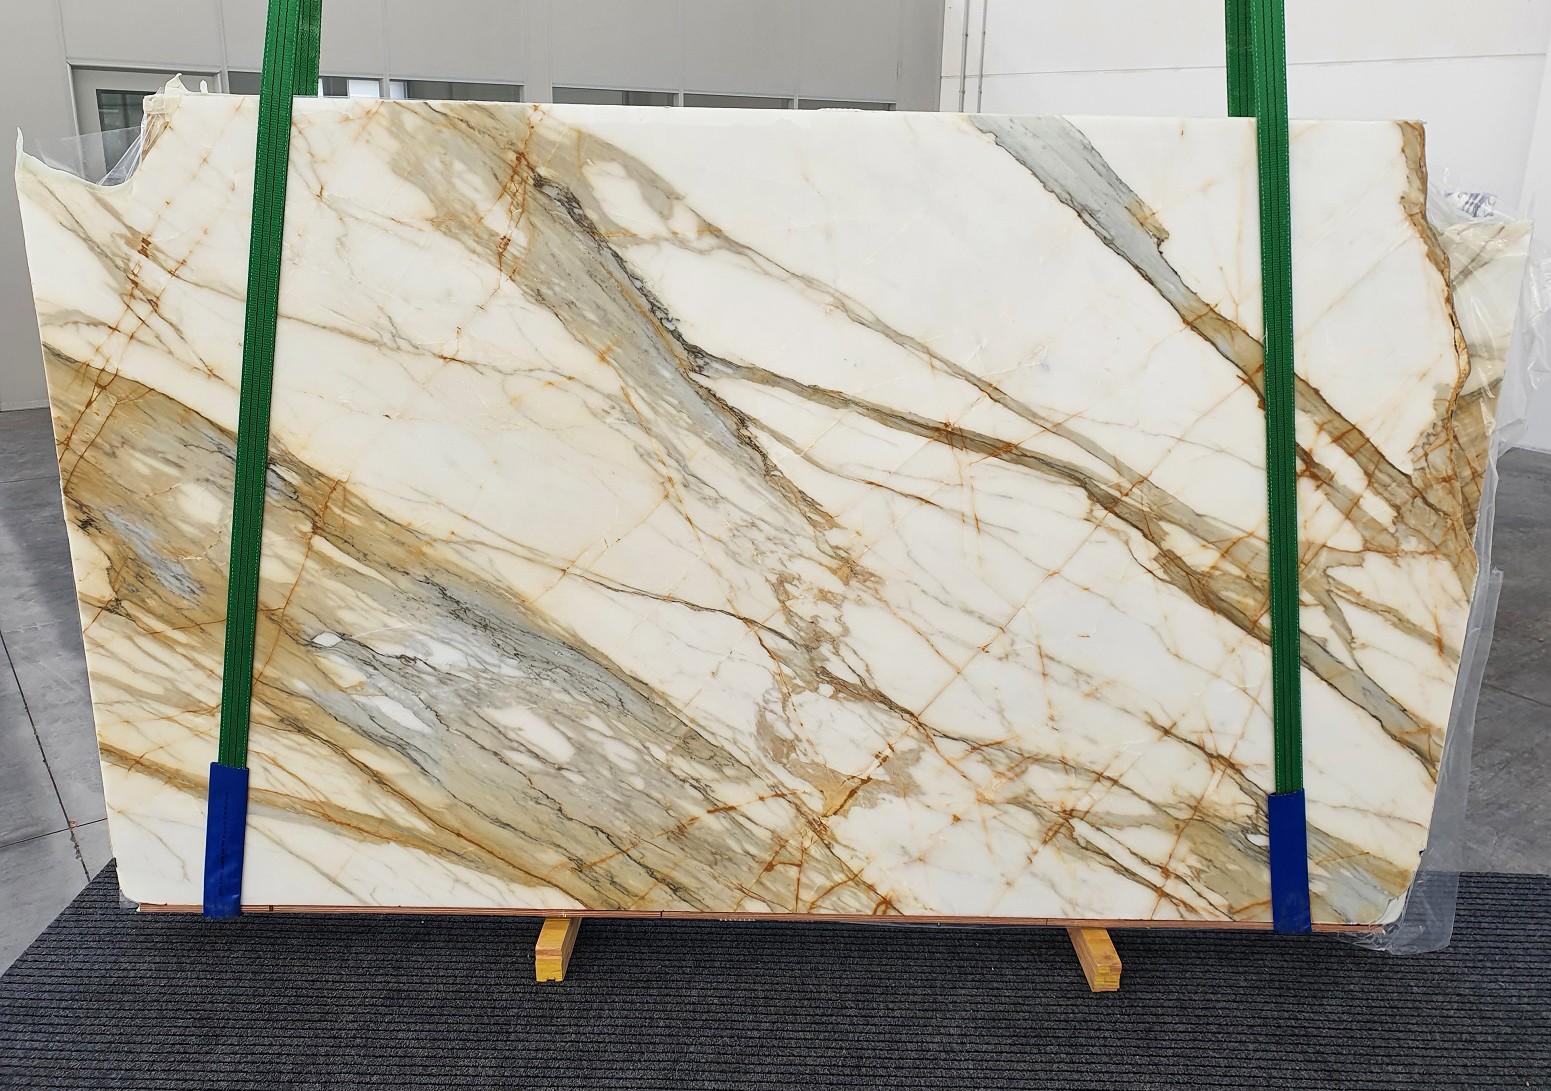 CALACATTA MACCHIAVECCHIA Suministro Veneto (Italia) de planchas pulidas en mármol natural 1272 , Slab #62